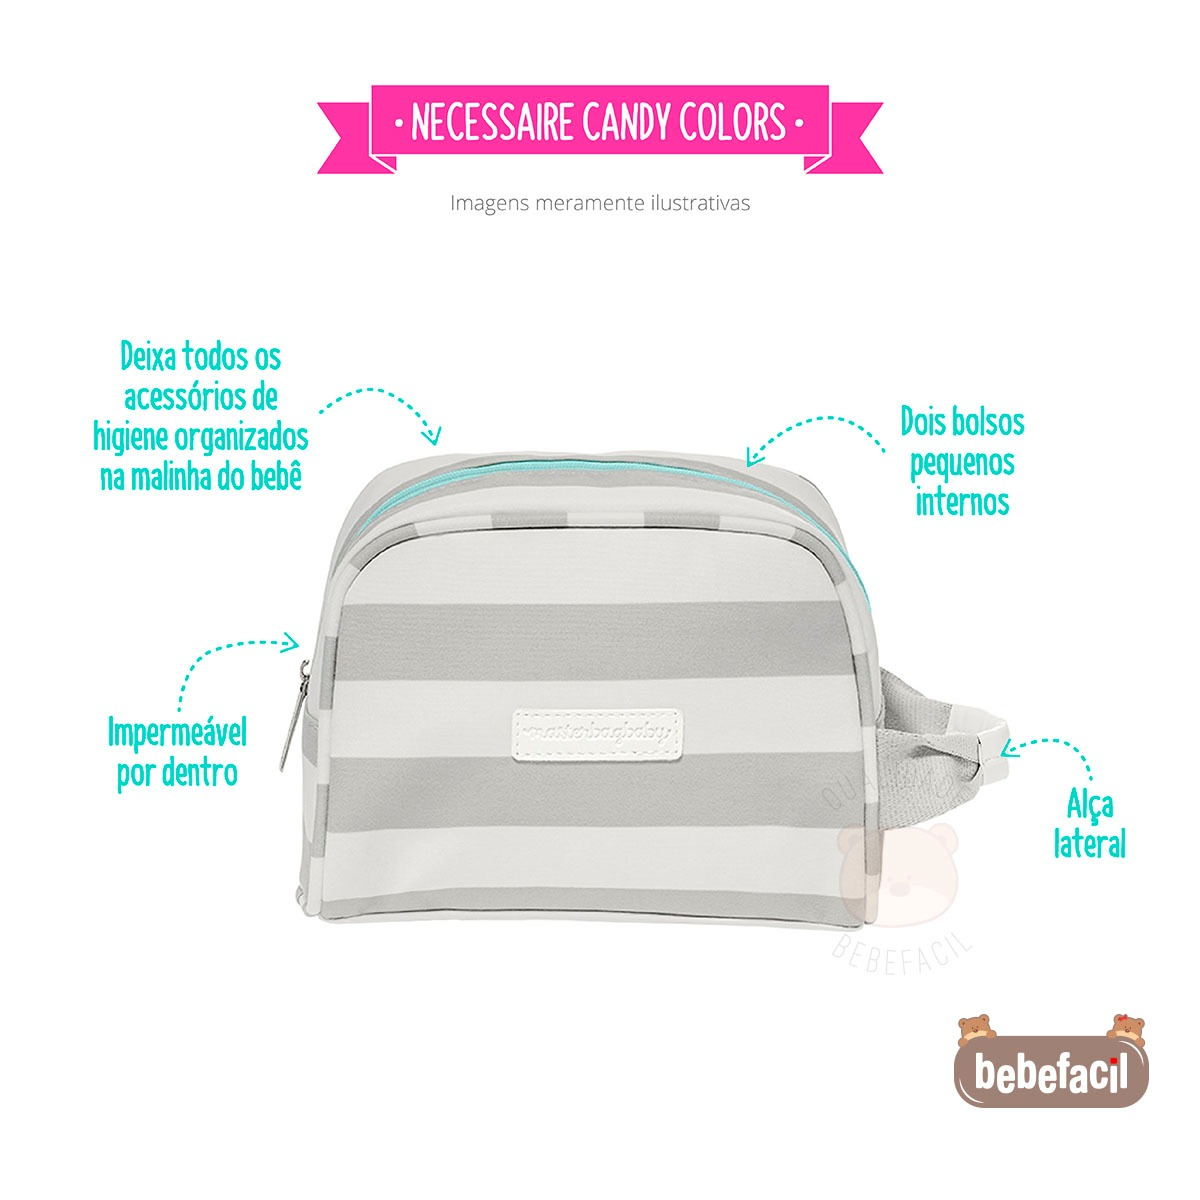 028db3a29 Necessaire Para Bebê Candy Colors Menta - Masterbag - R$ 168,90 em ...